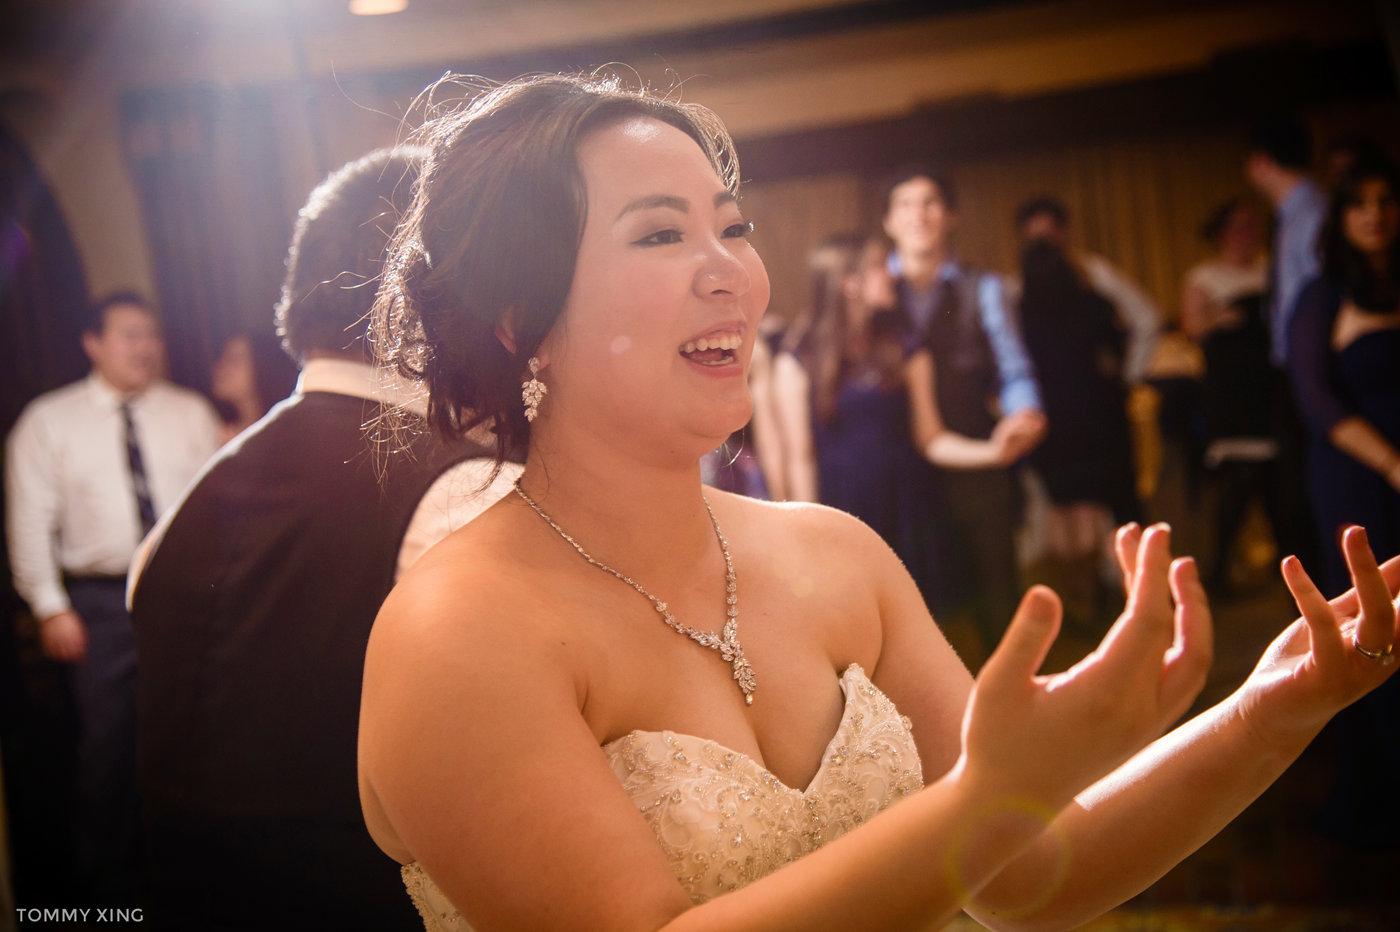 STANFORD MEMORIAL CHURCH WEDDING - Wenjie & Chengcheng - SAN FRANCISCO BAY AREA 斯坦福教堂婚礼跟拍 - 洛杉矶婚礼婚纱照摄影师 Tommy Xing Photography268.jpg